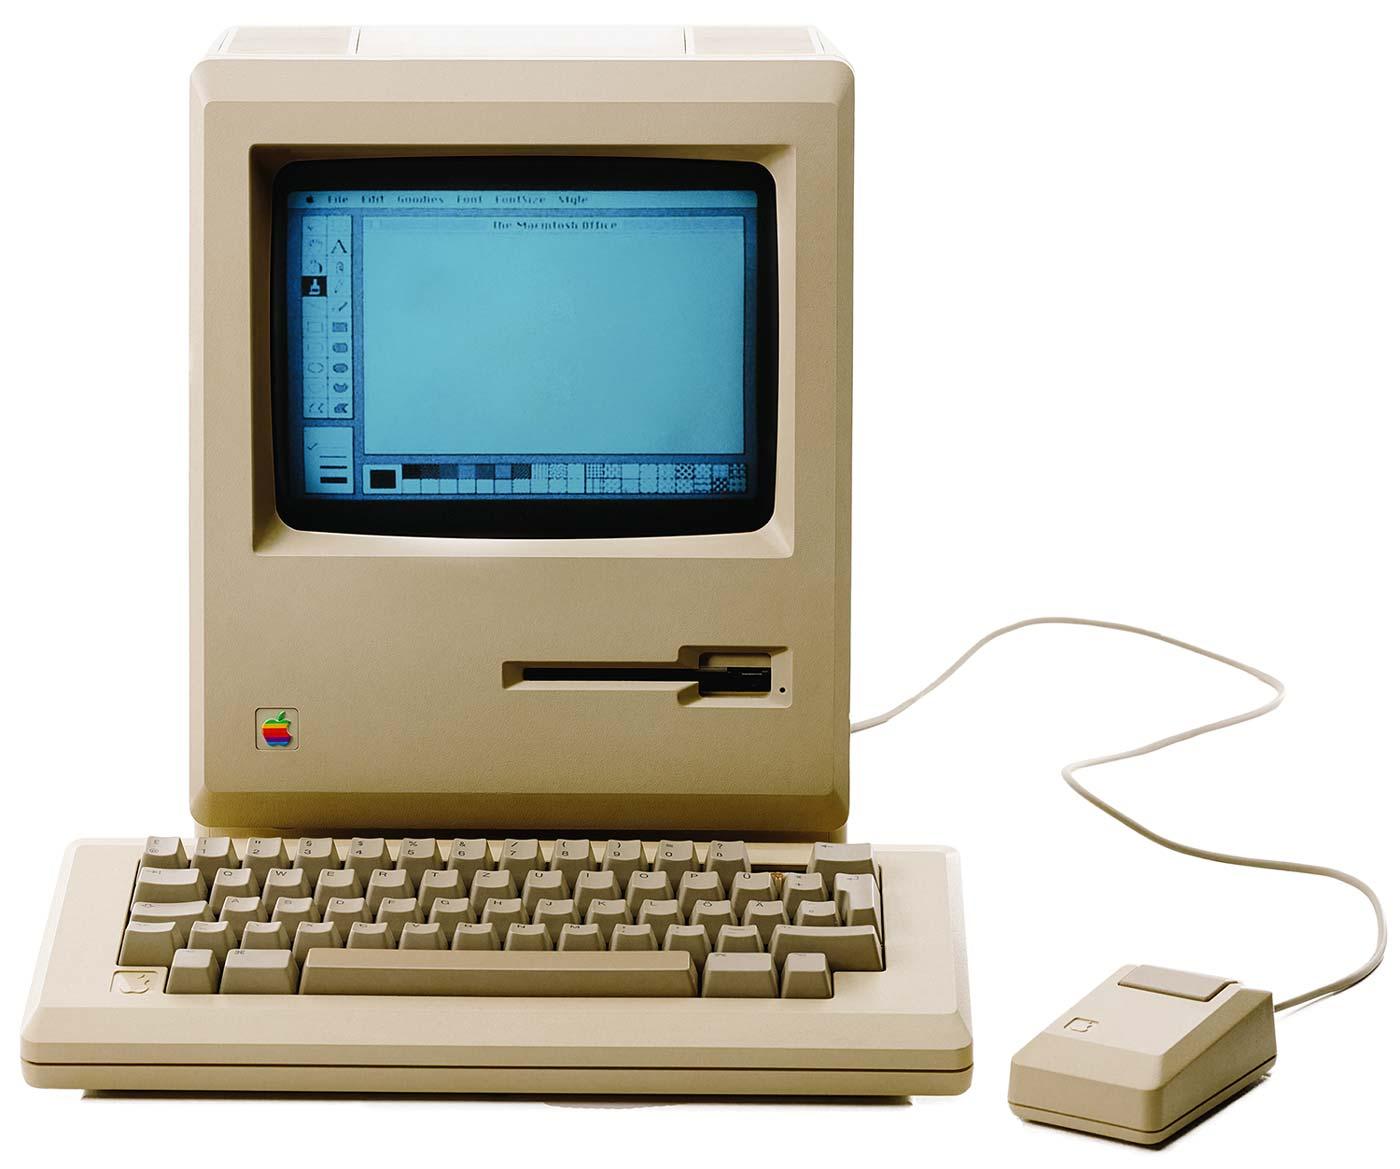 Old Apple Mac Computer